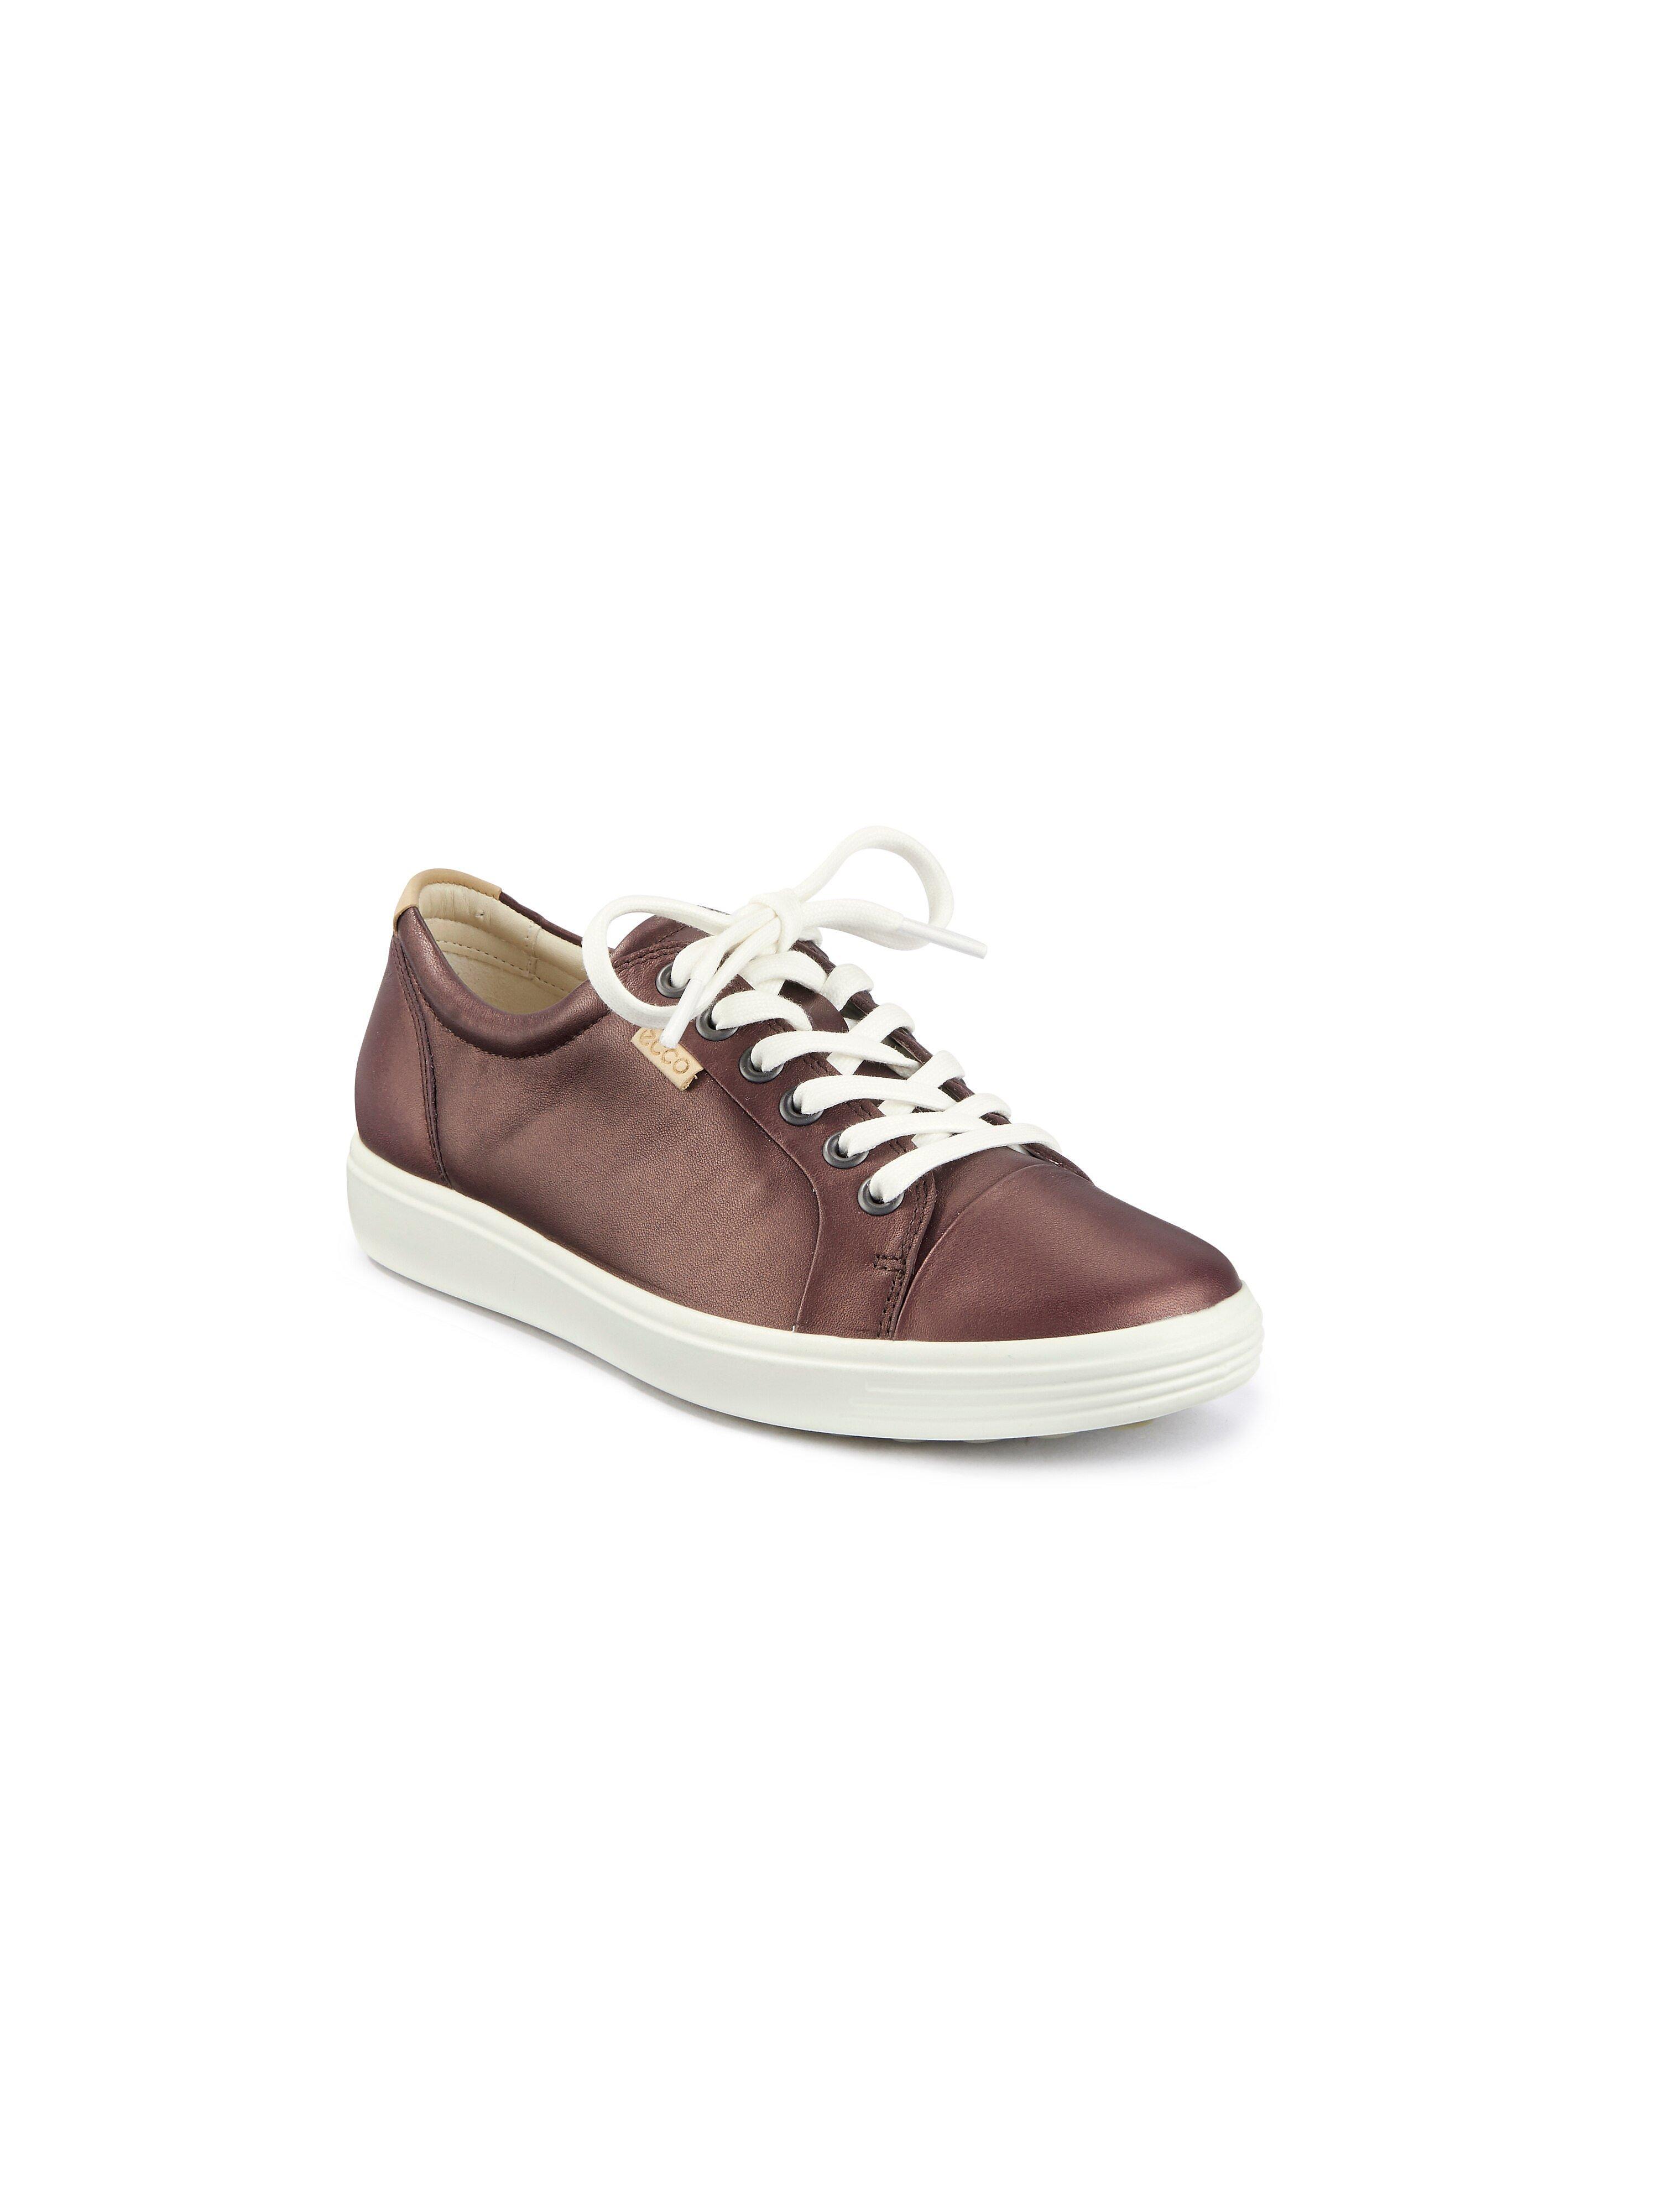 Sneakers model Soft 7 Van Ecco rood